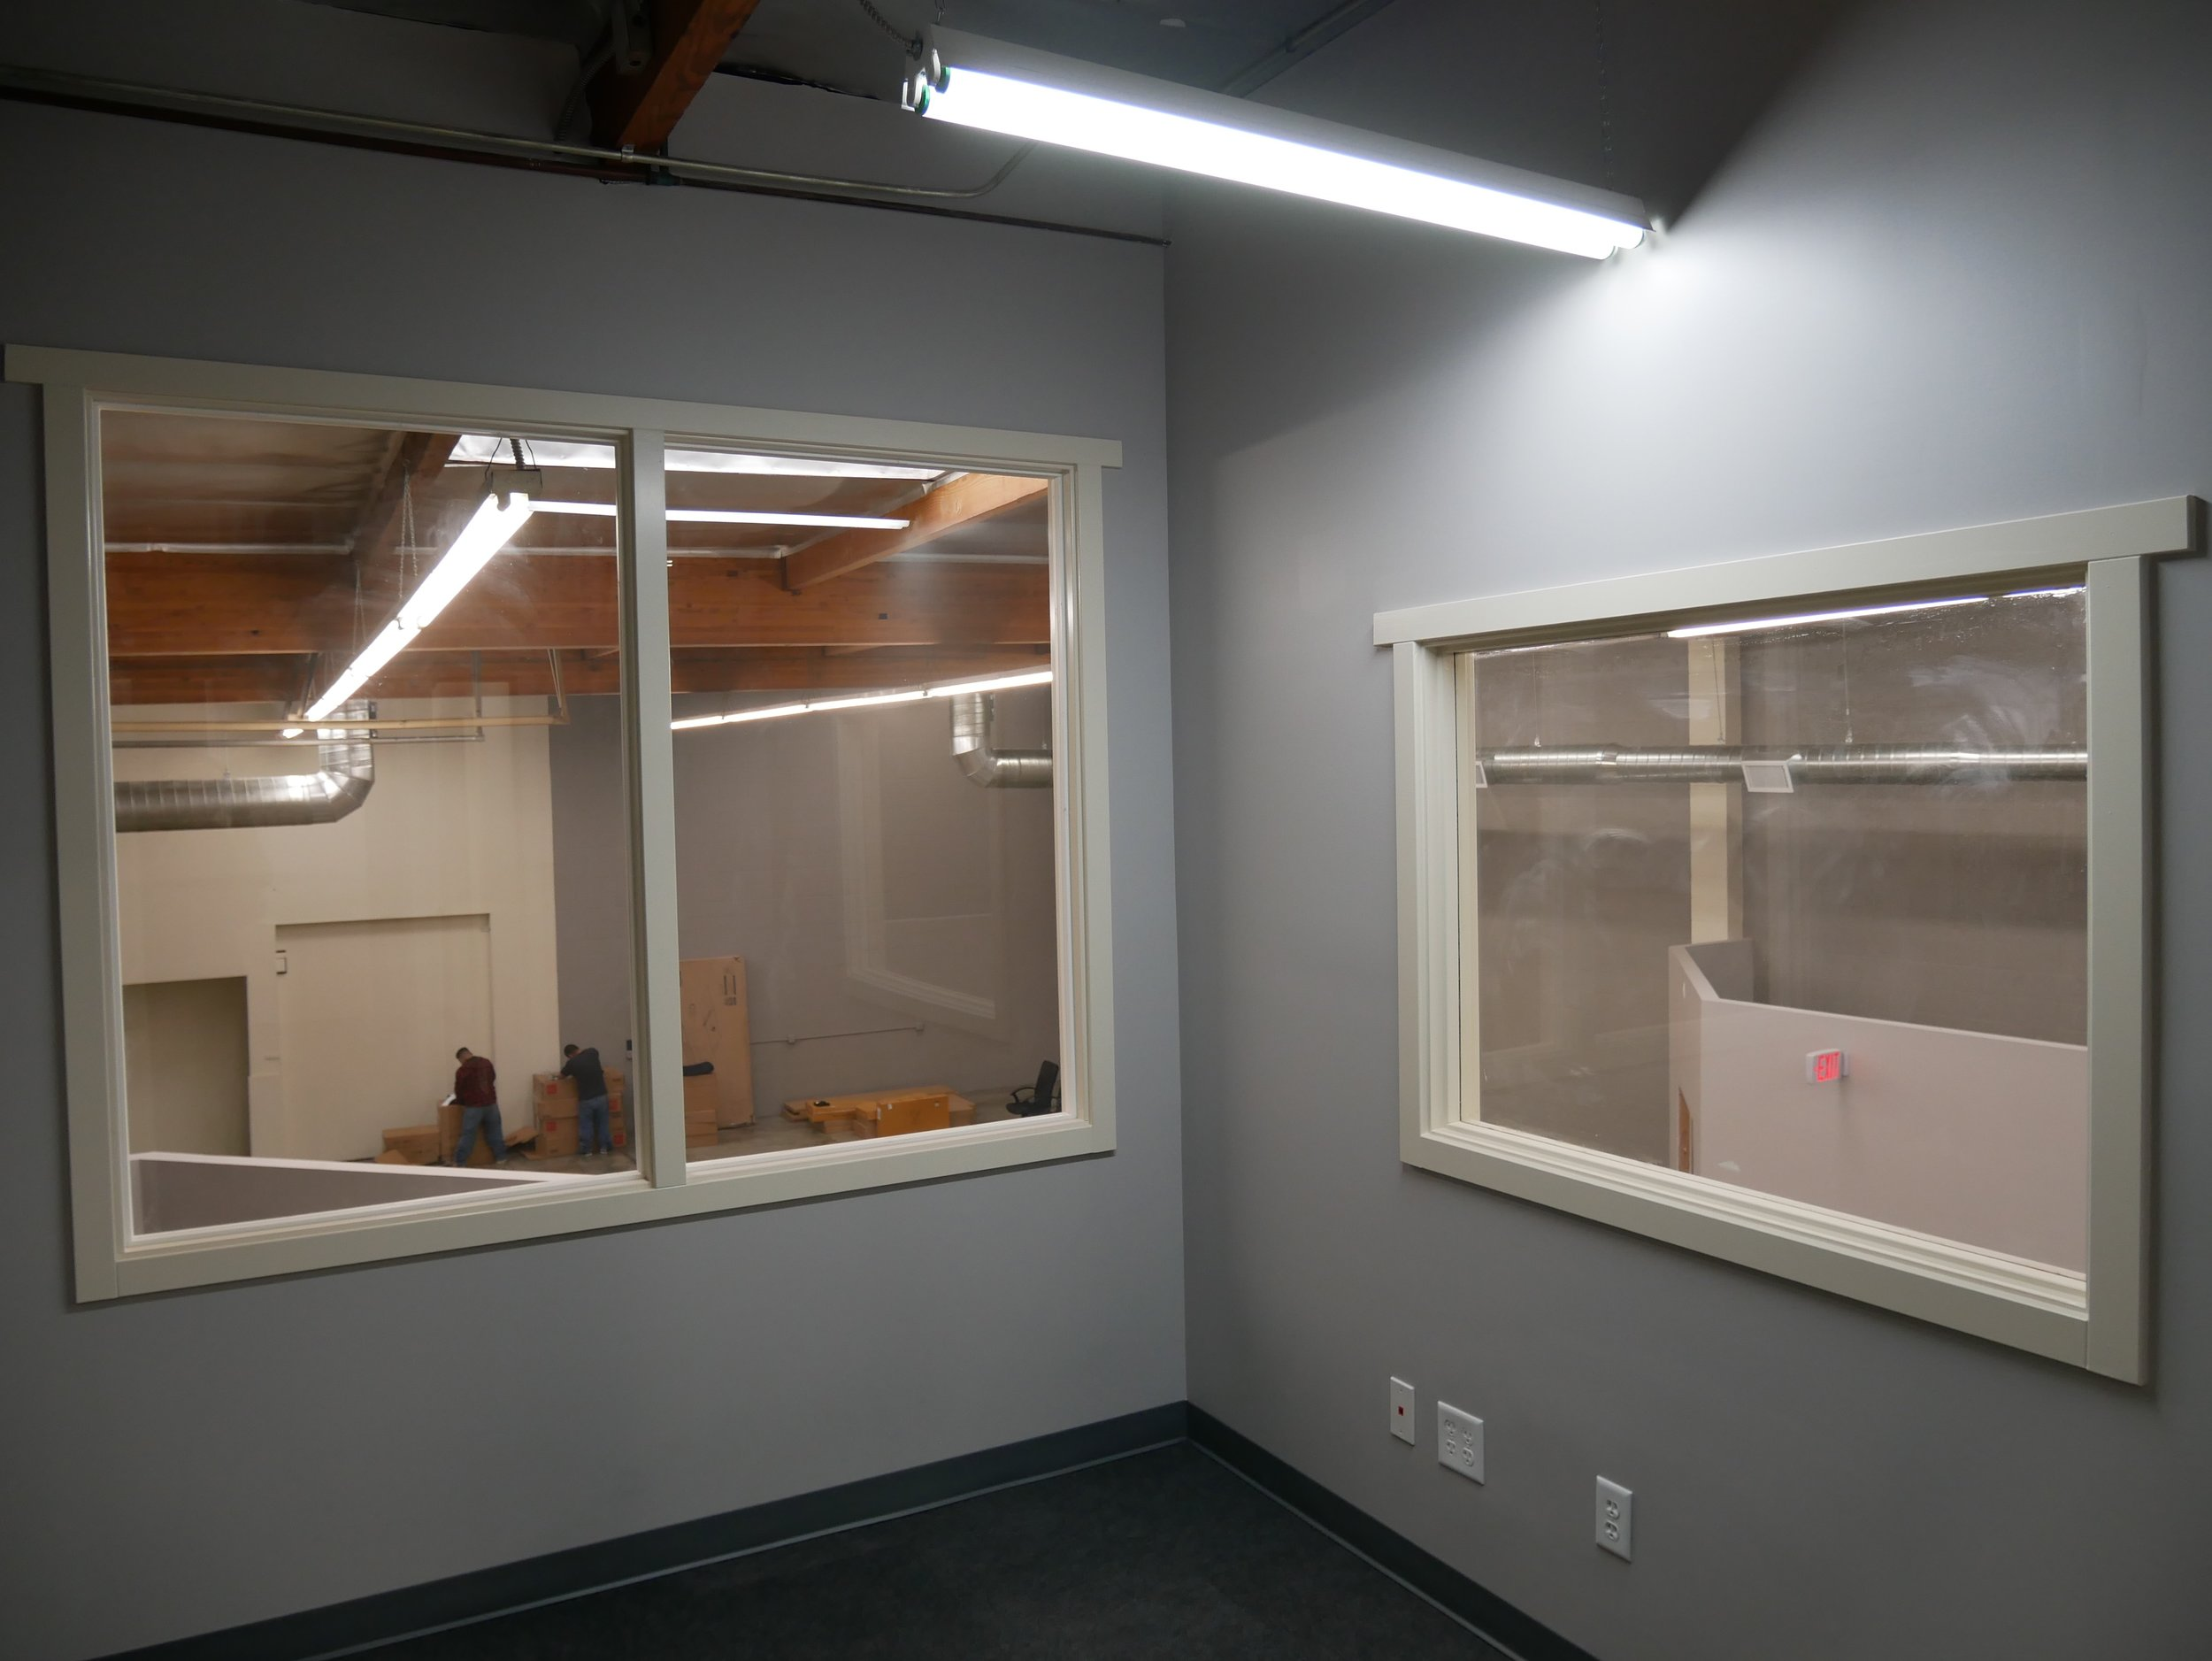 Production Studio Common Area18.jpeg